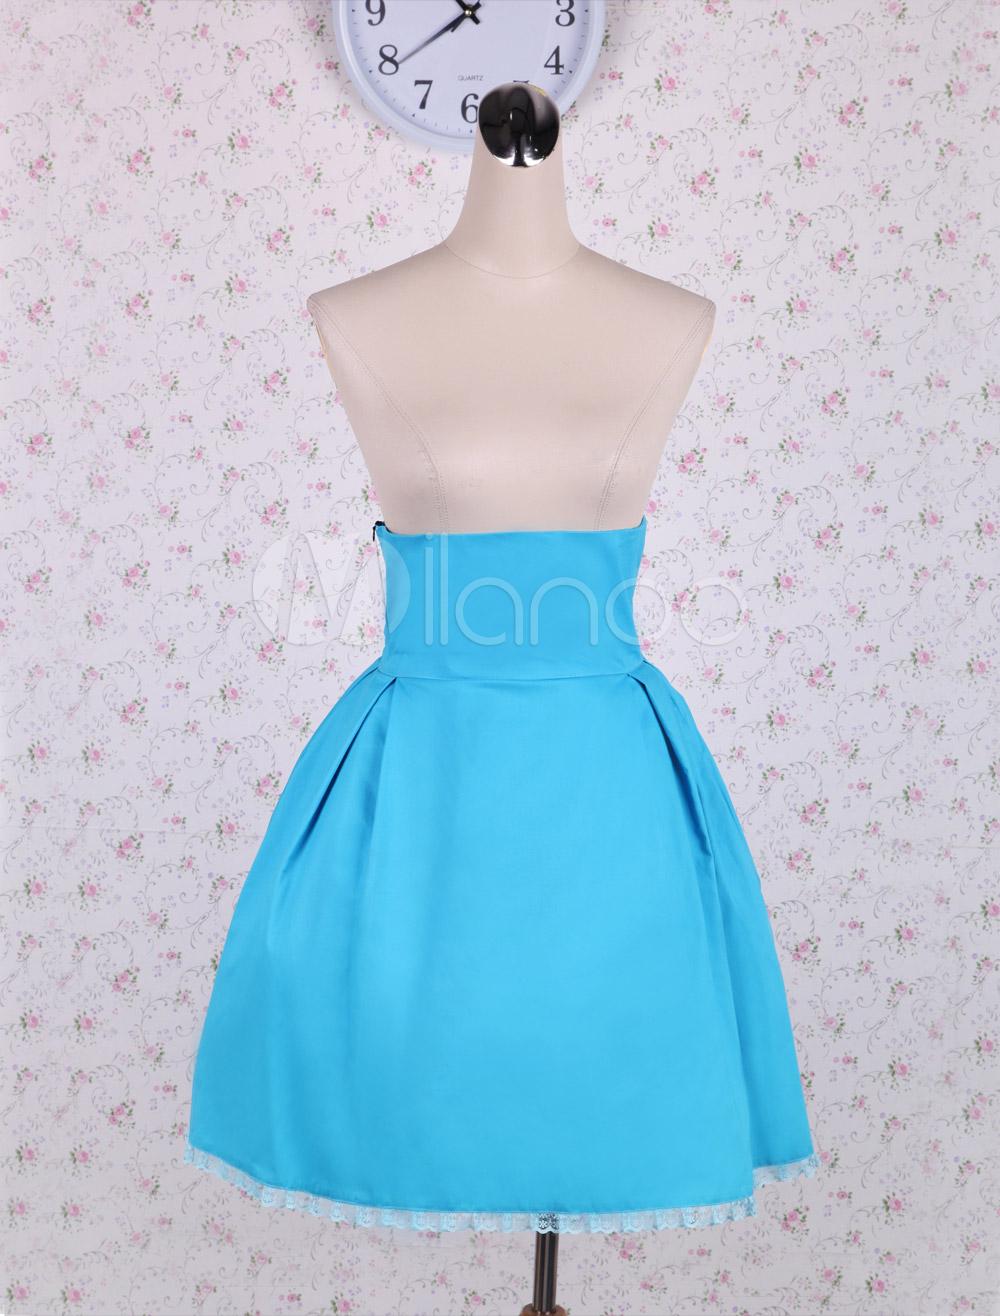 Simple Light Blue Pleated Cotton Lolita Skirt - Milanoo.com